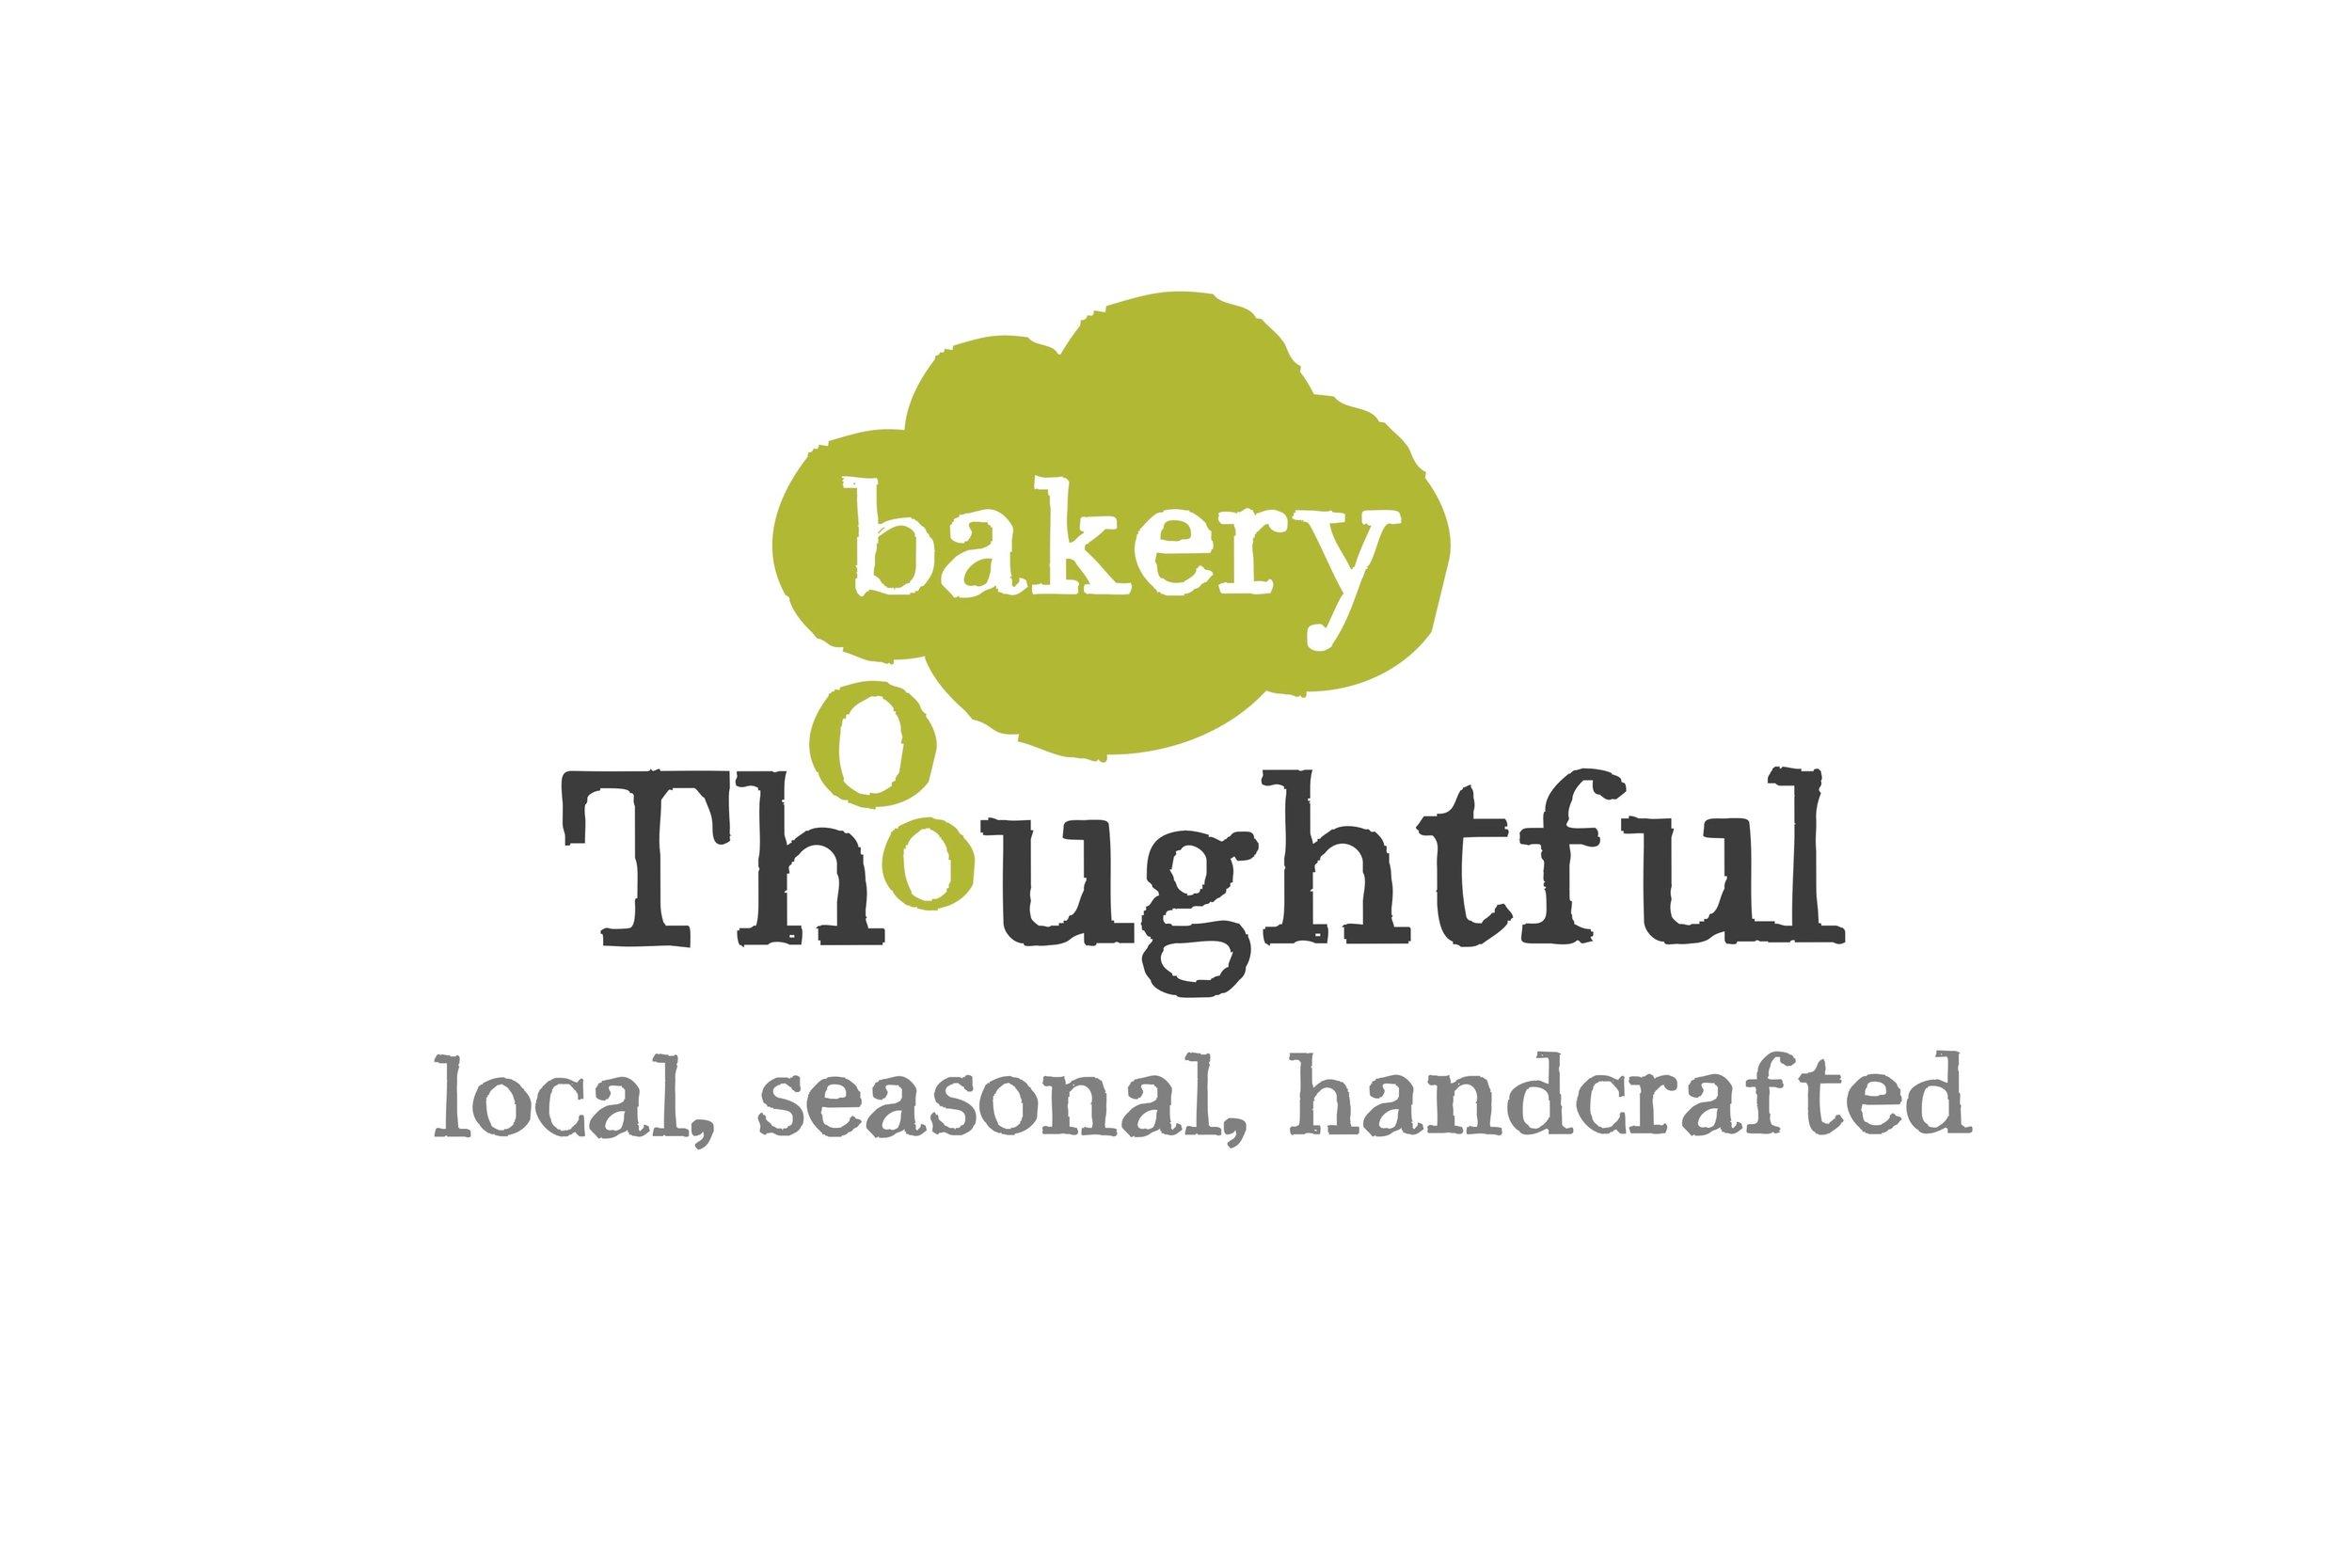 Thoughtful Bakery - Logo Strap RGB 08-11-2016 2.jpg